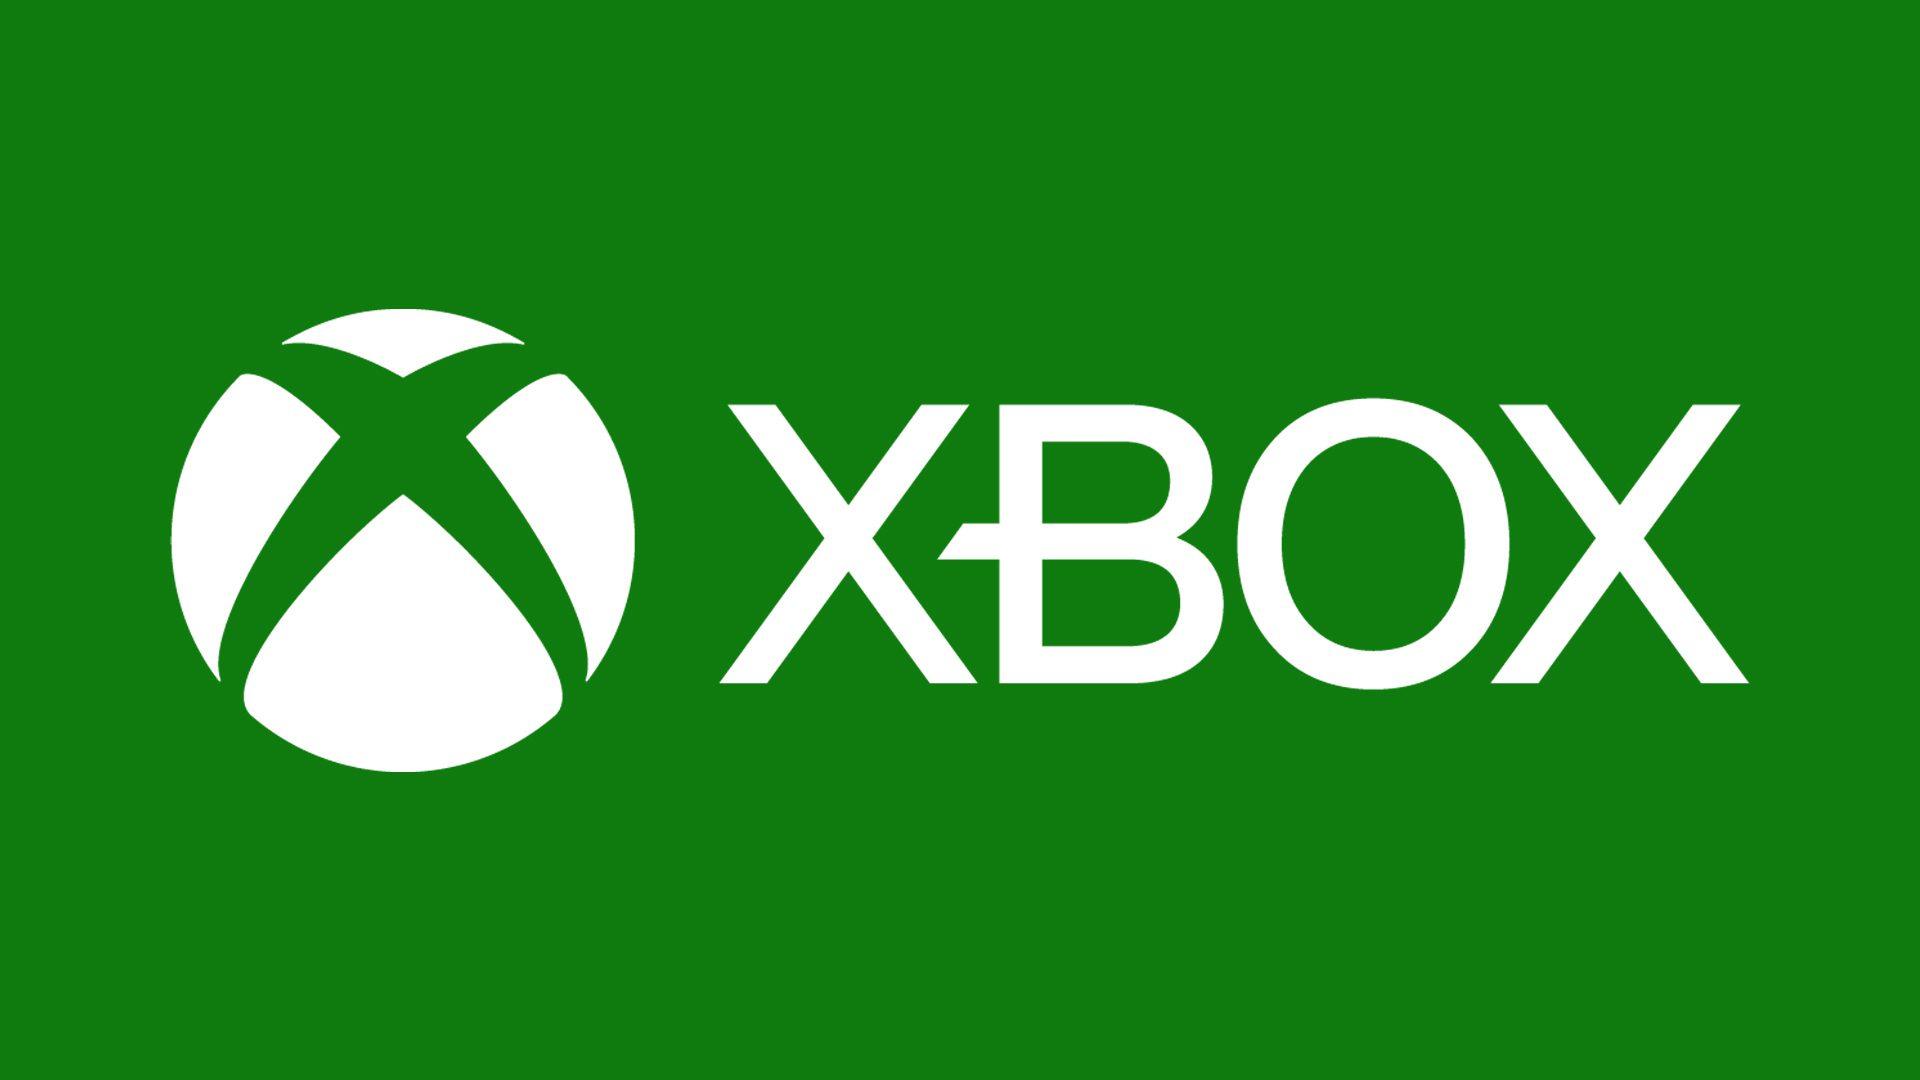 Xbox特别宣传片 老奶奶与孙子通过游戏增进亲情